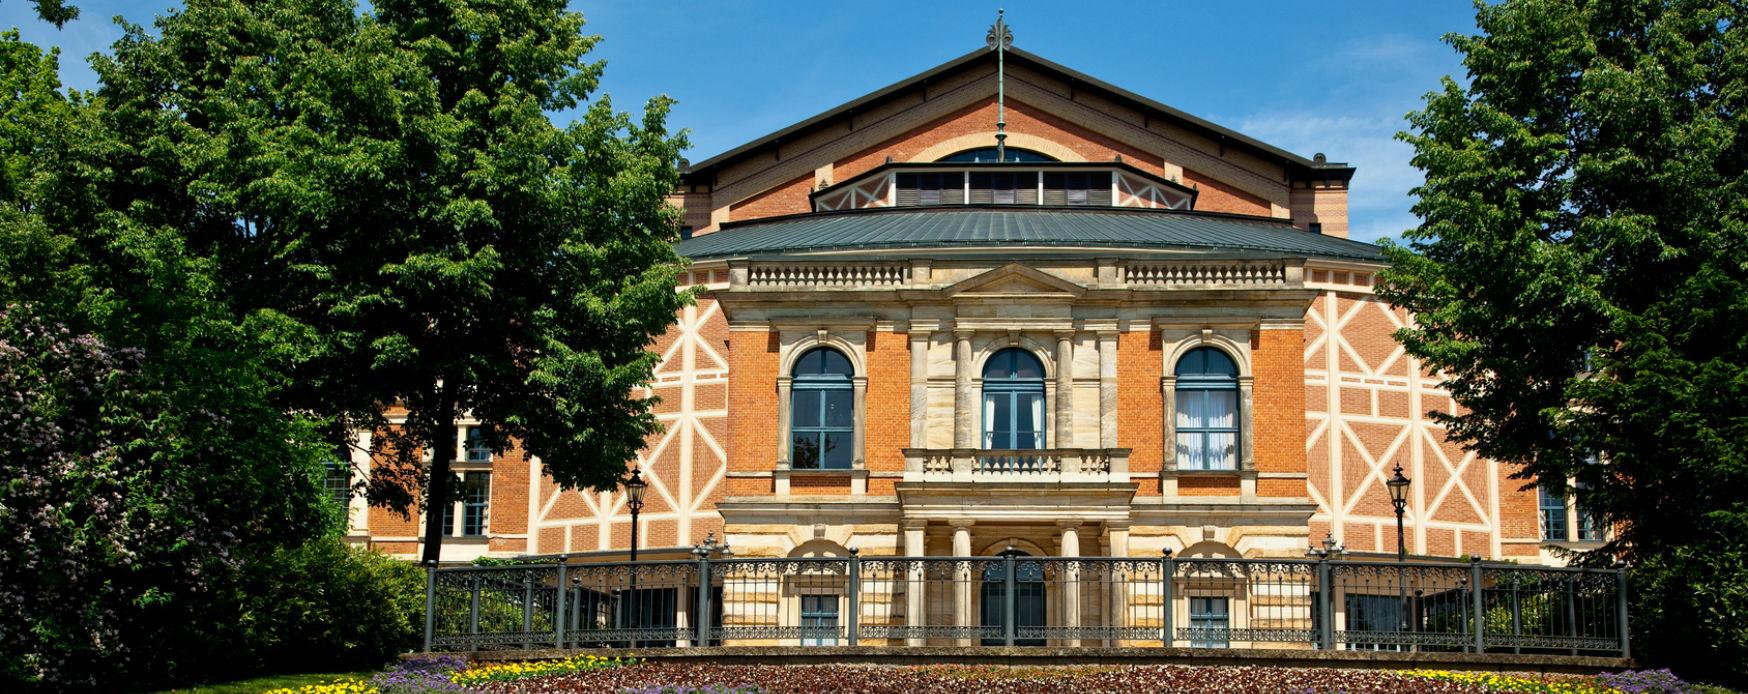 Standort bayreuth consilium finanzmanagement ag for Depot bayreuth